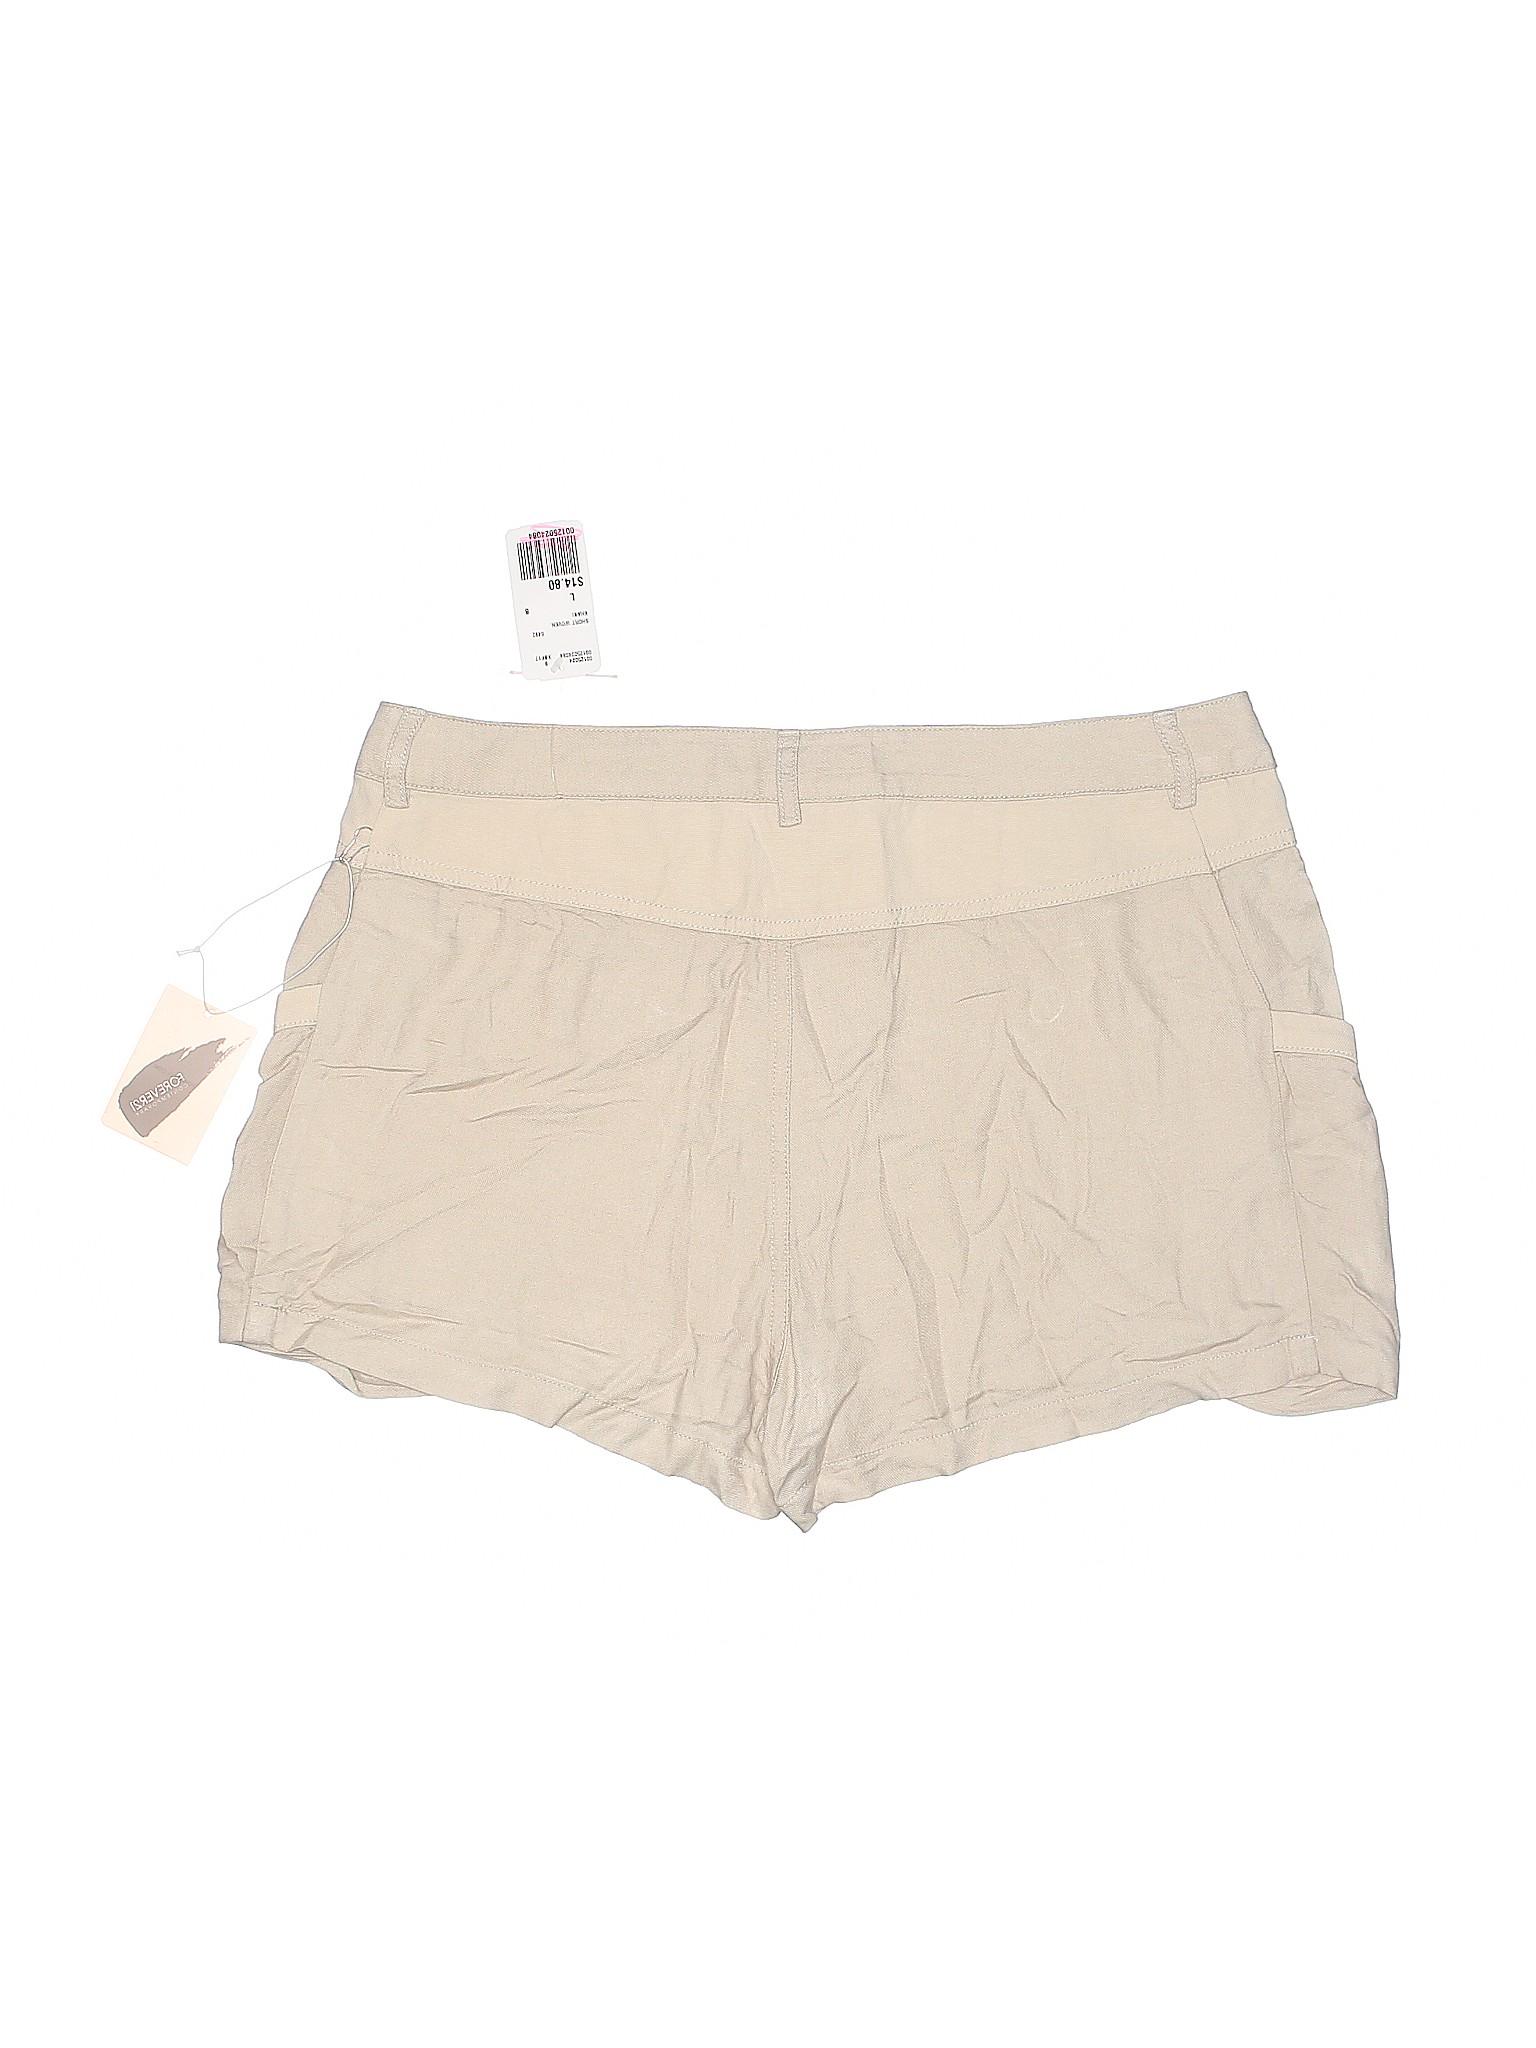 Boutique Forever Boutique Forever Shorts 21 dYqdP6